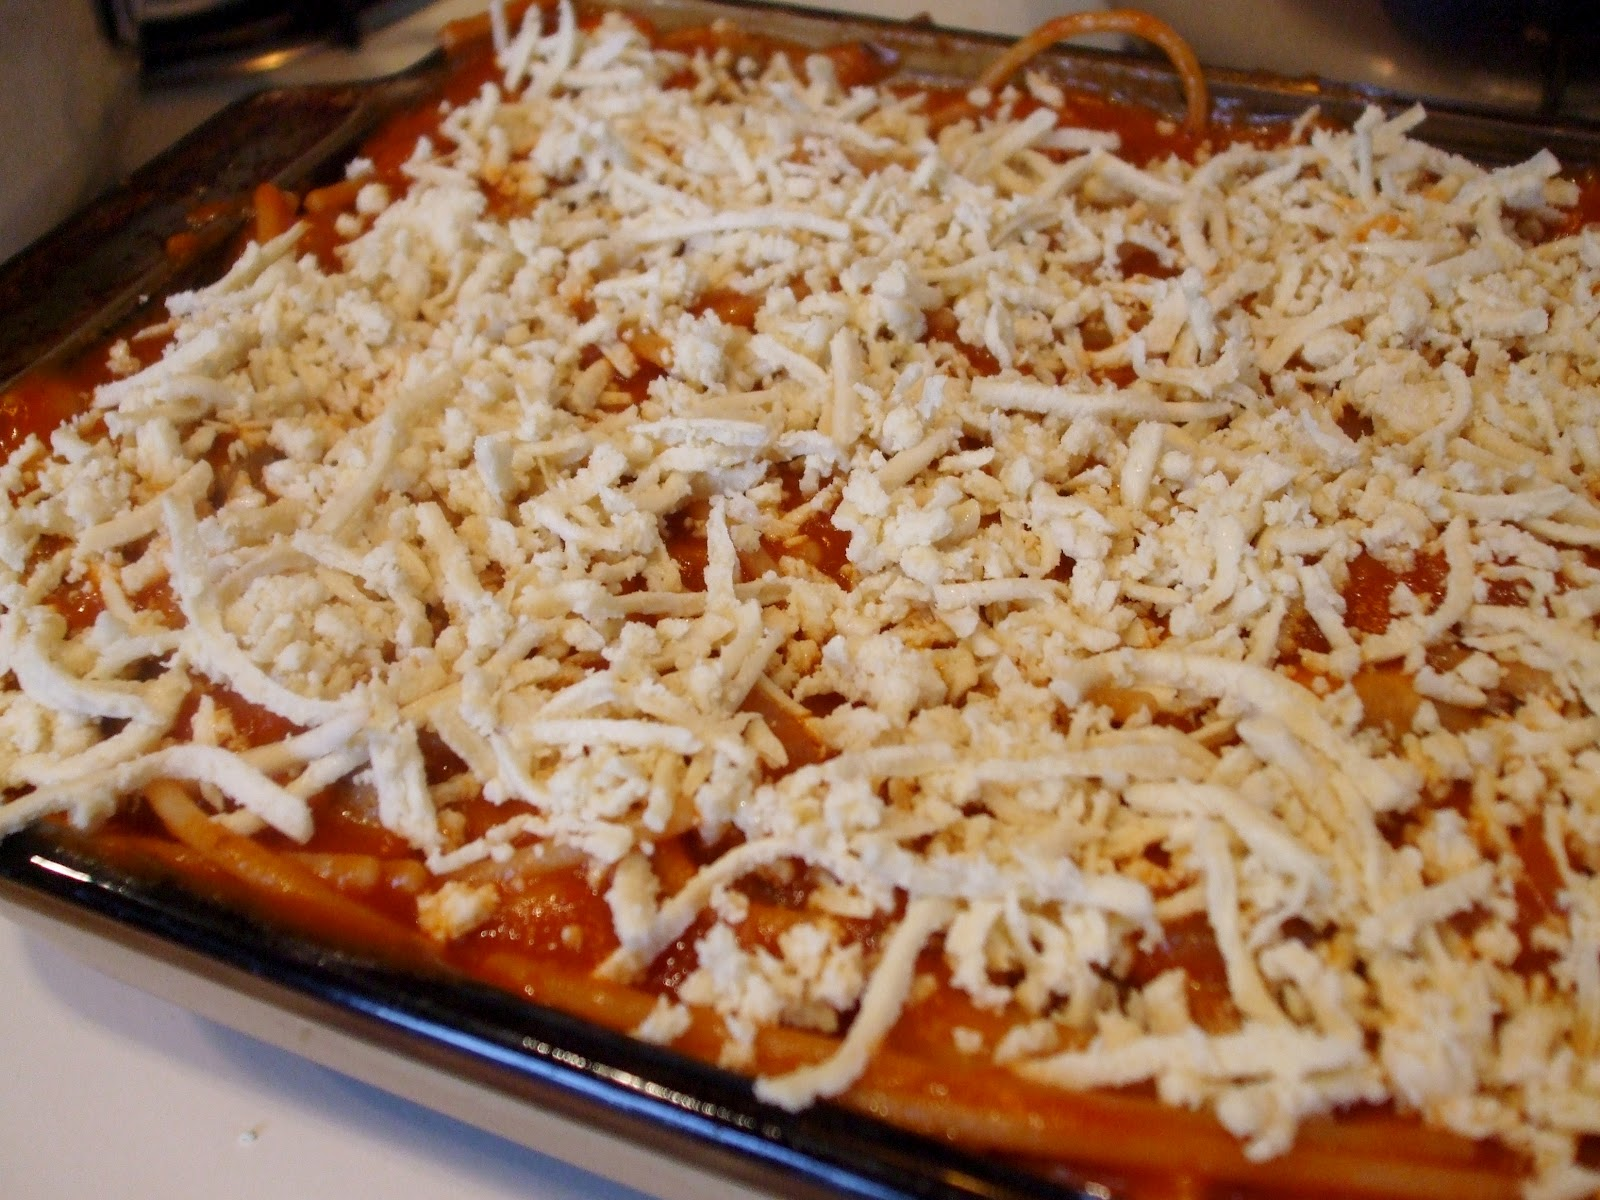 The Woodchuck Vegan: Spaghetti Pie